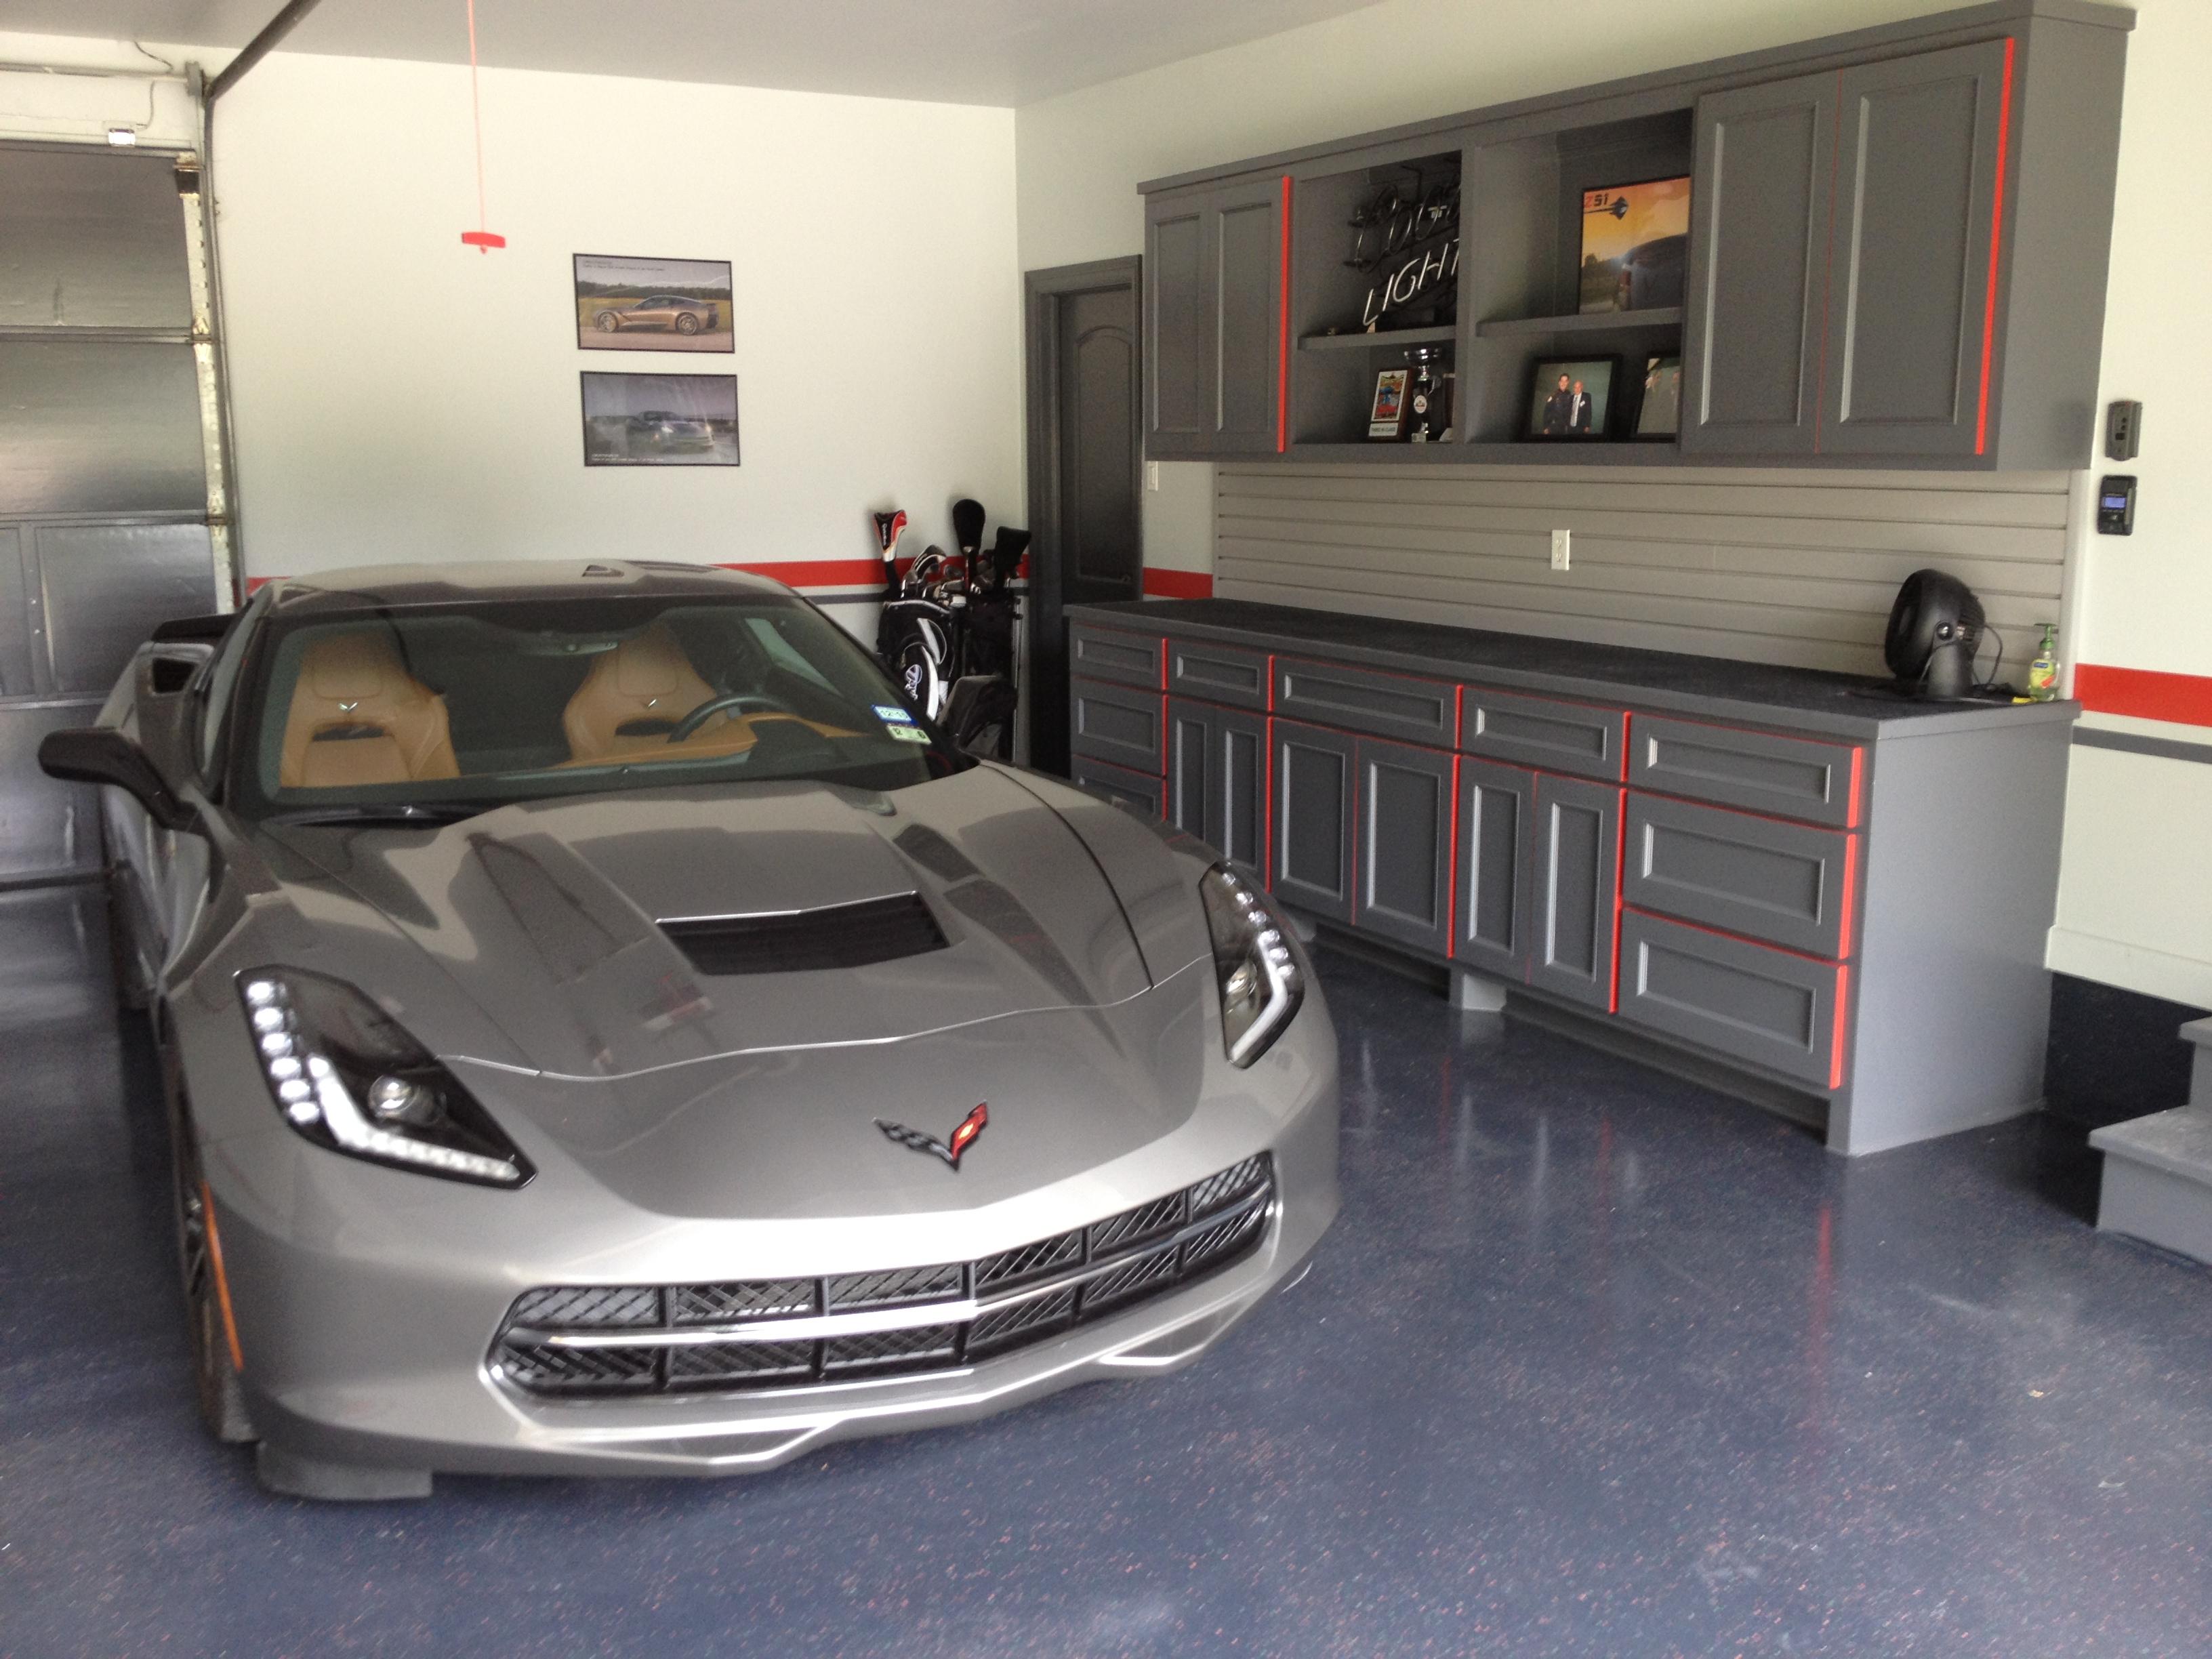 Corvette Signs Garage : Let s see your cool garage pictures porcelain signs